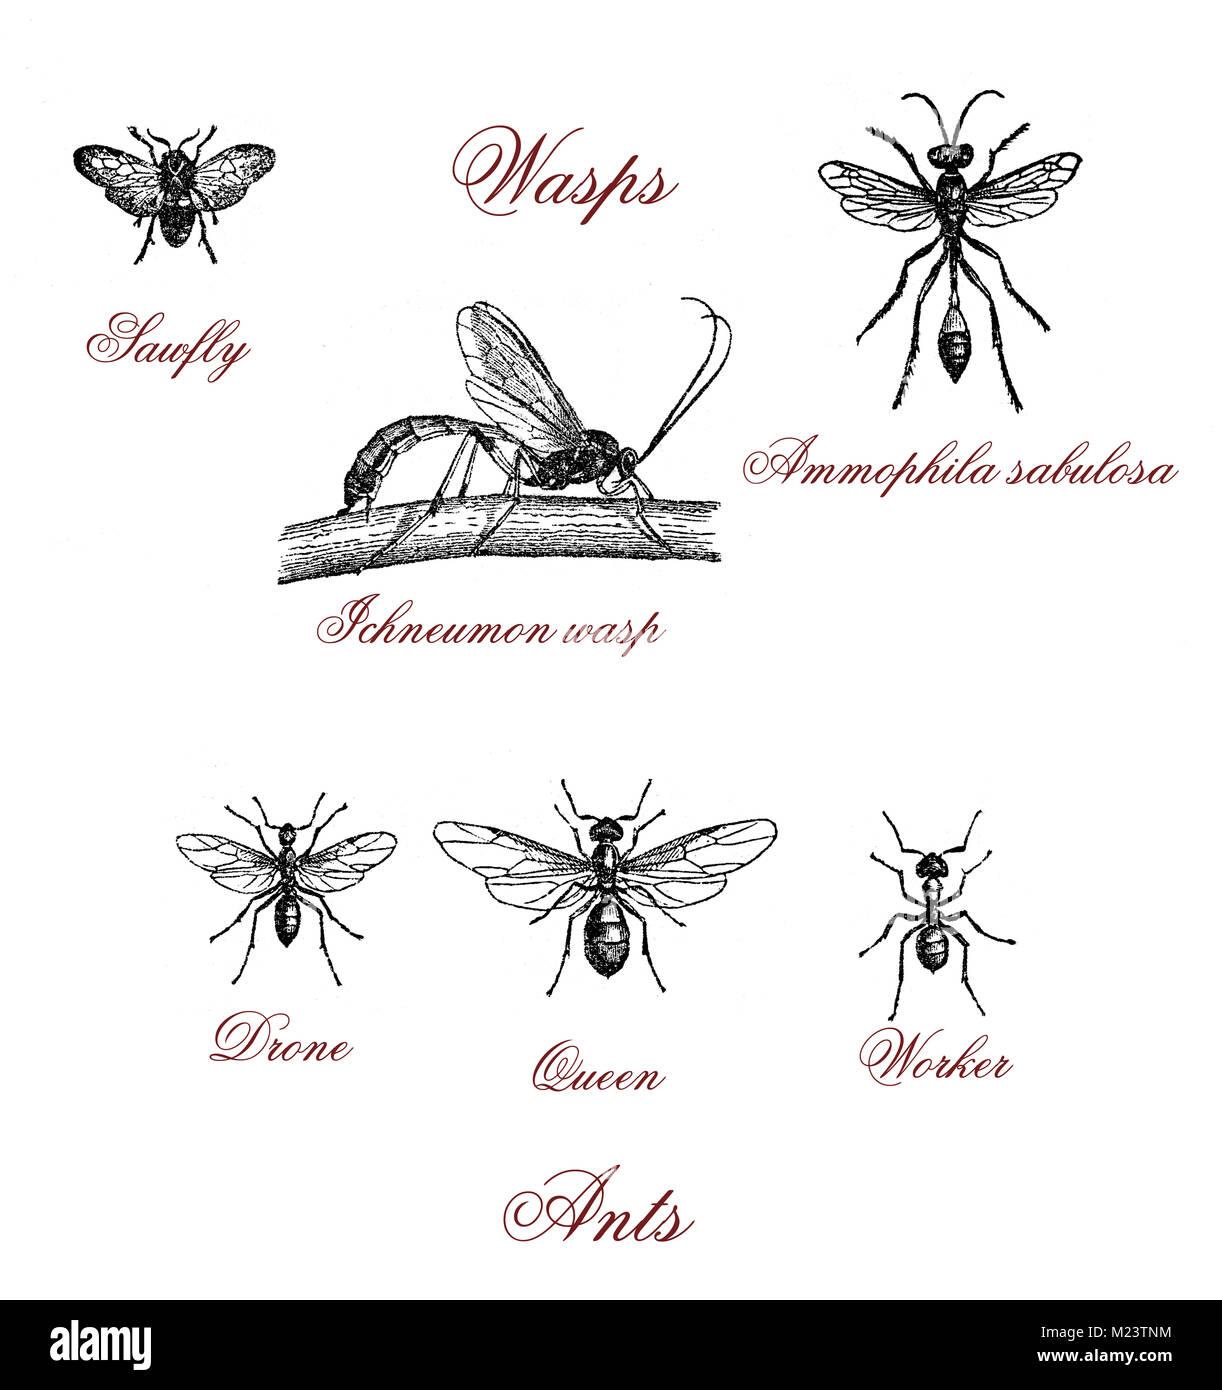 Ants and different kind of wasps, vintage illustration - Stock Image